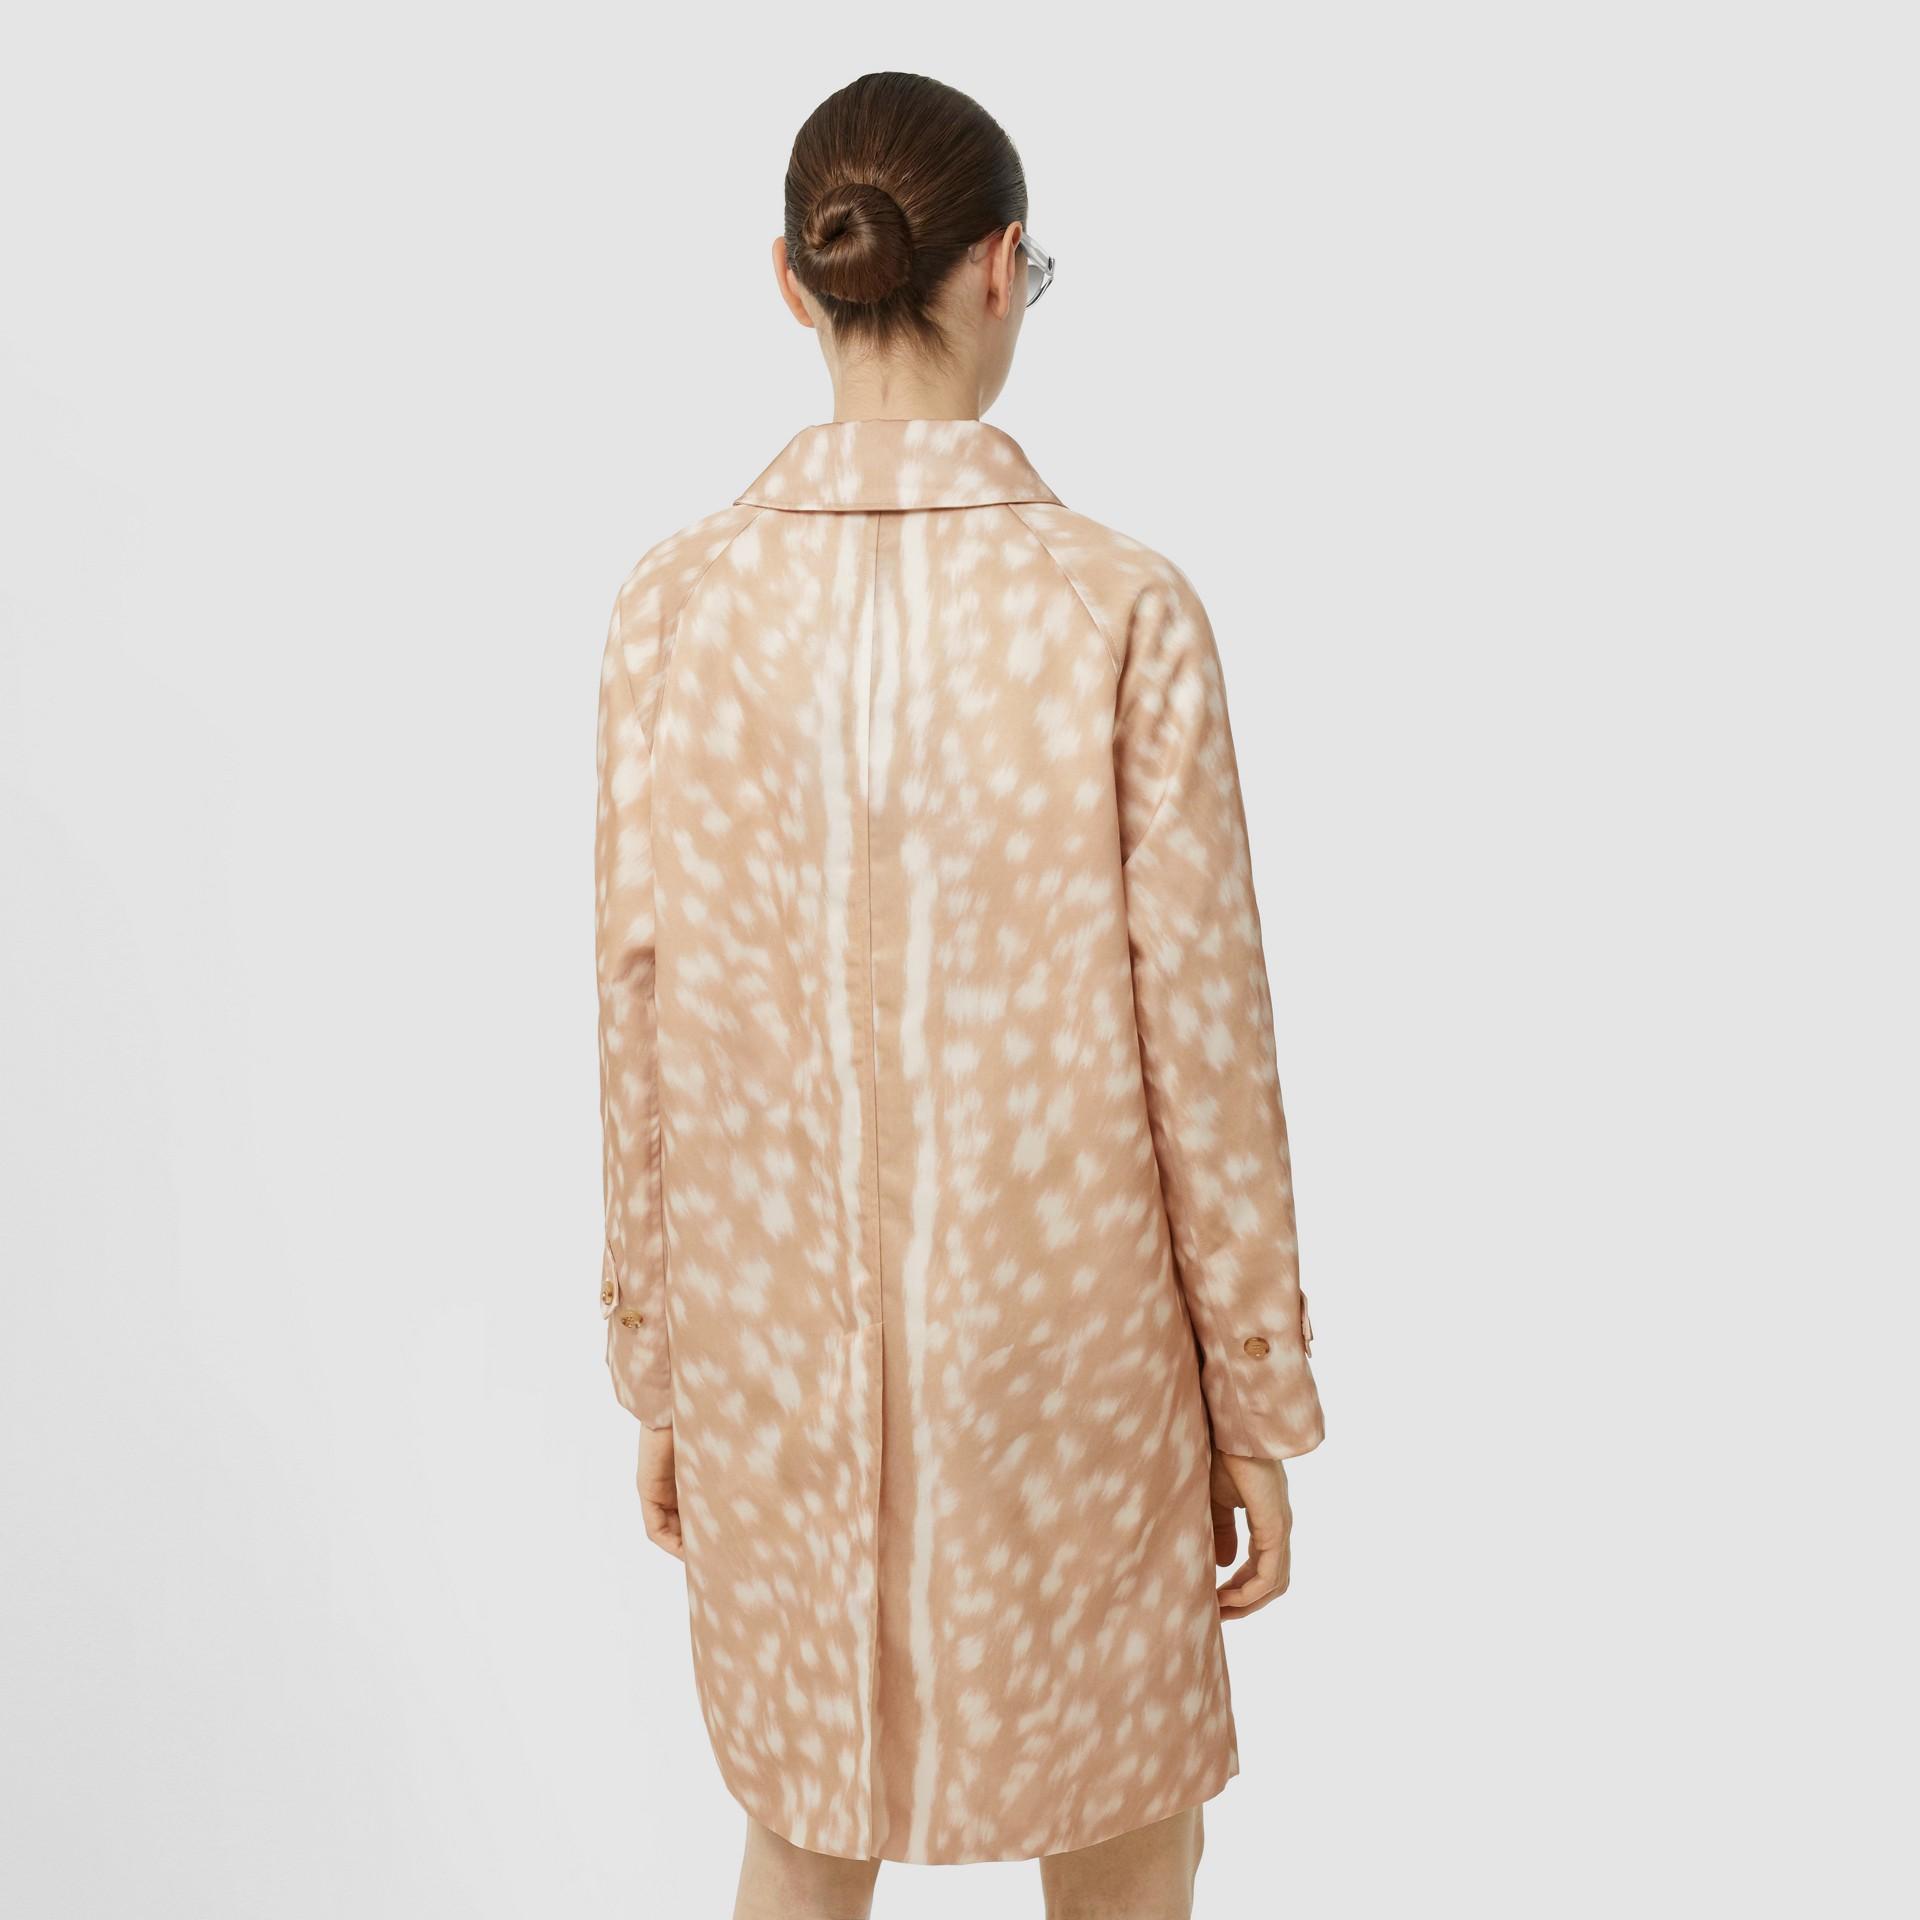 Deer Print Nylon Car Coat in Soft Fawn - Women | Burberry United Kingdom - gallery image 2